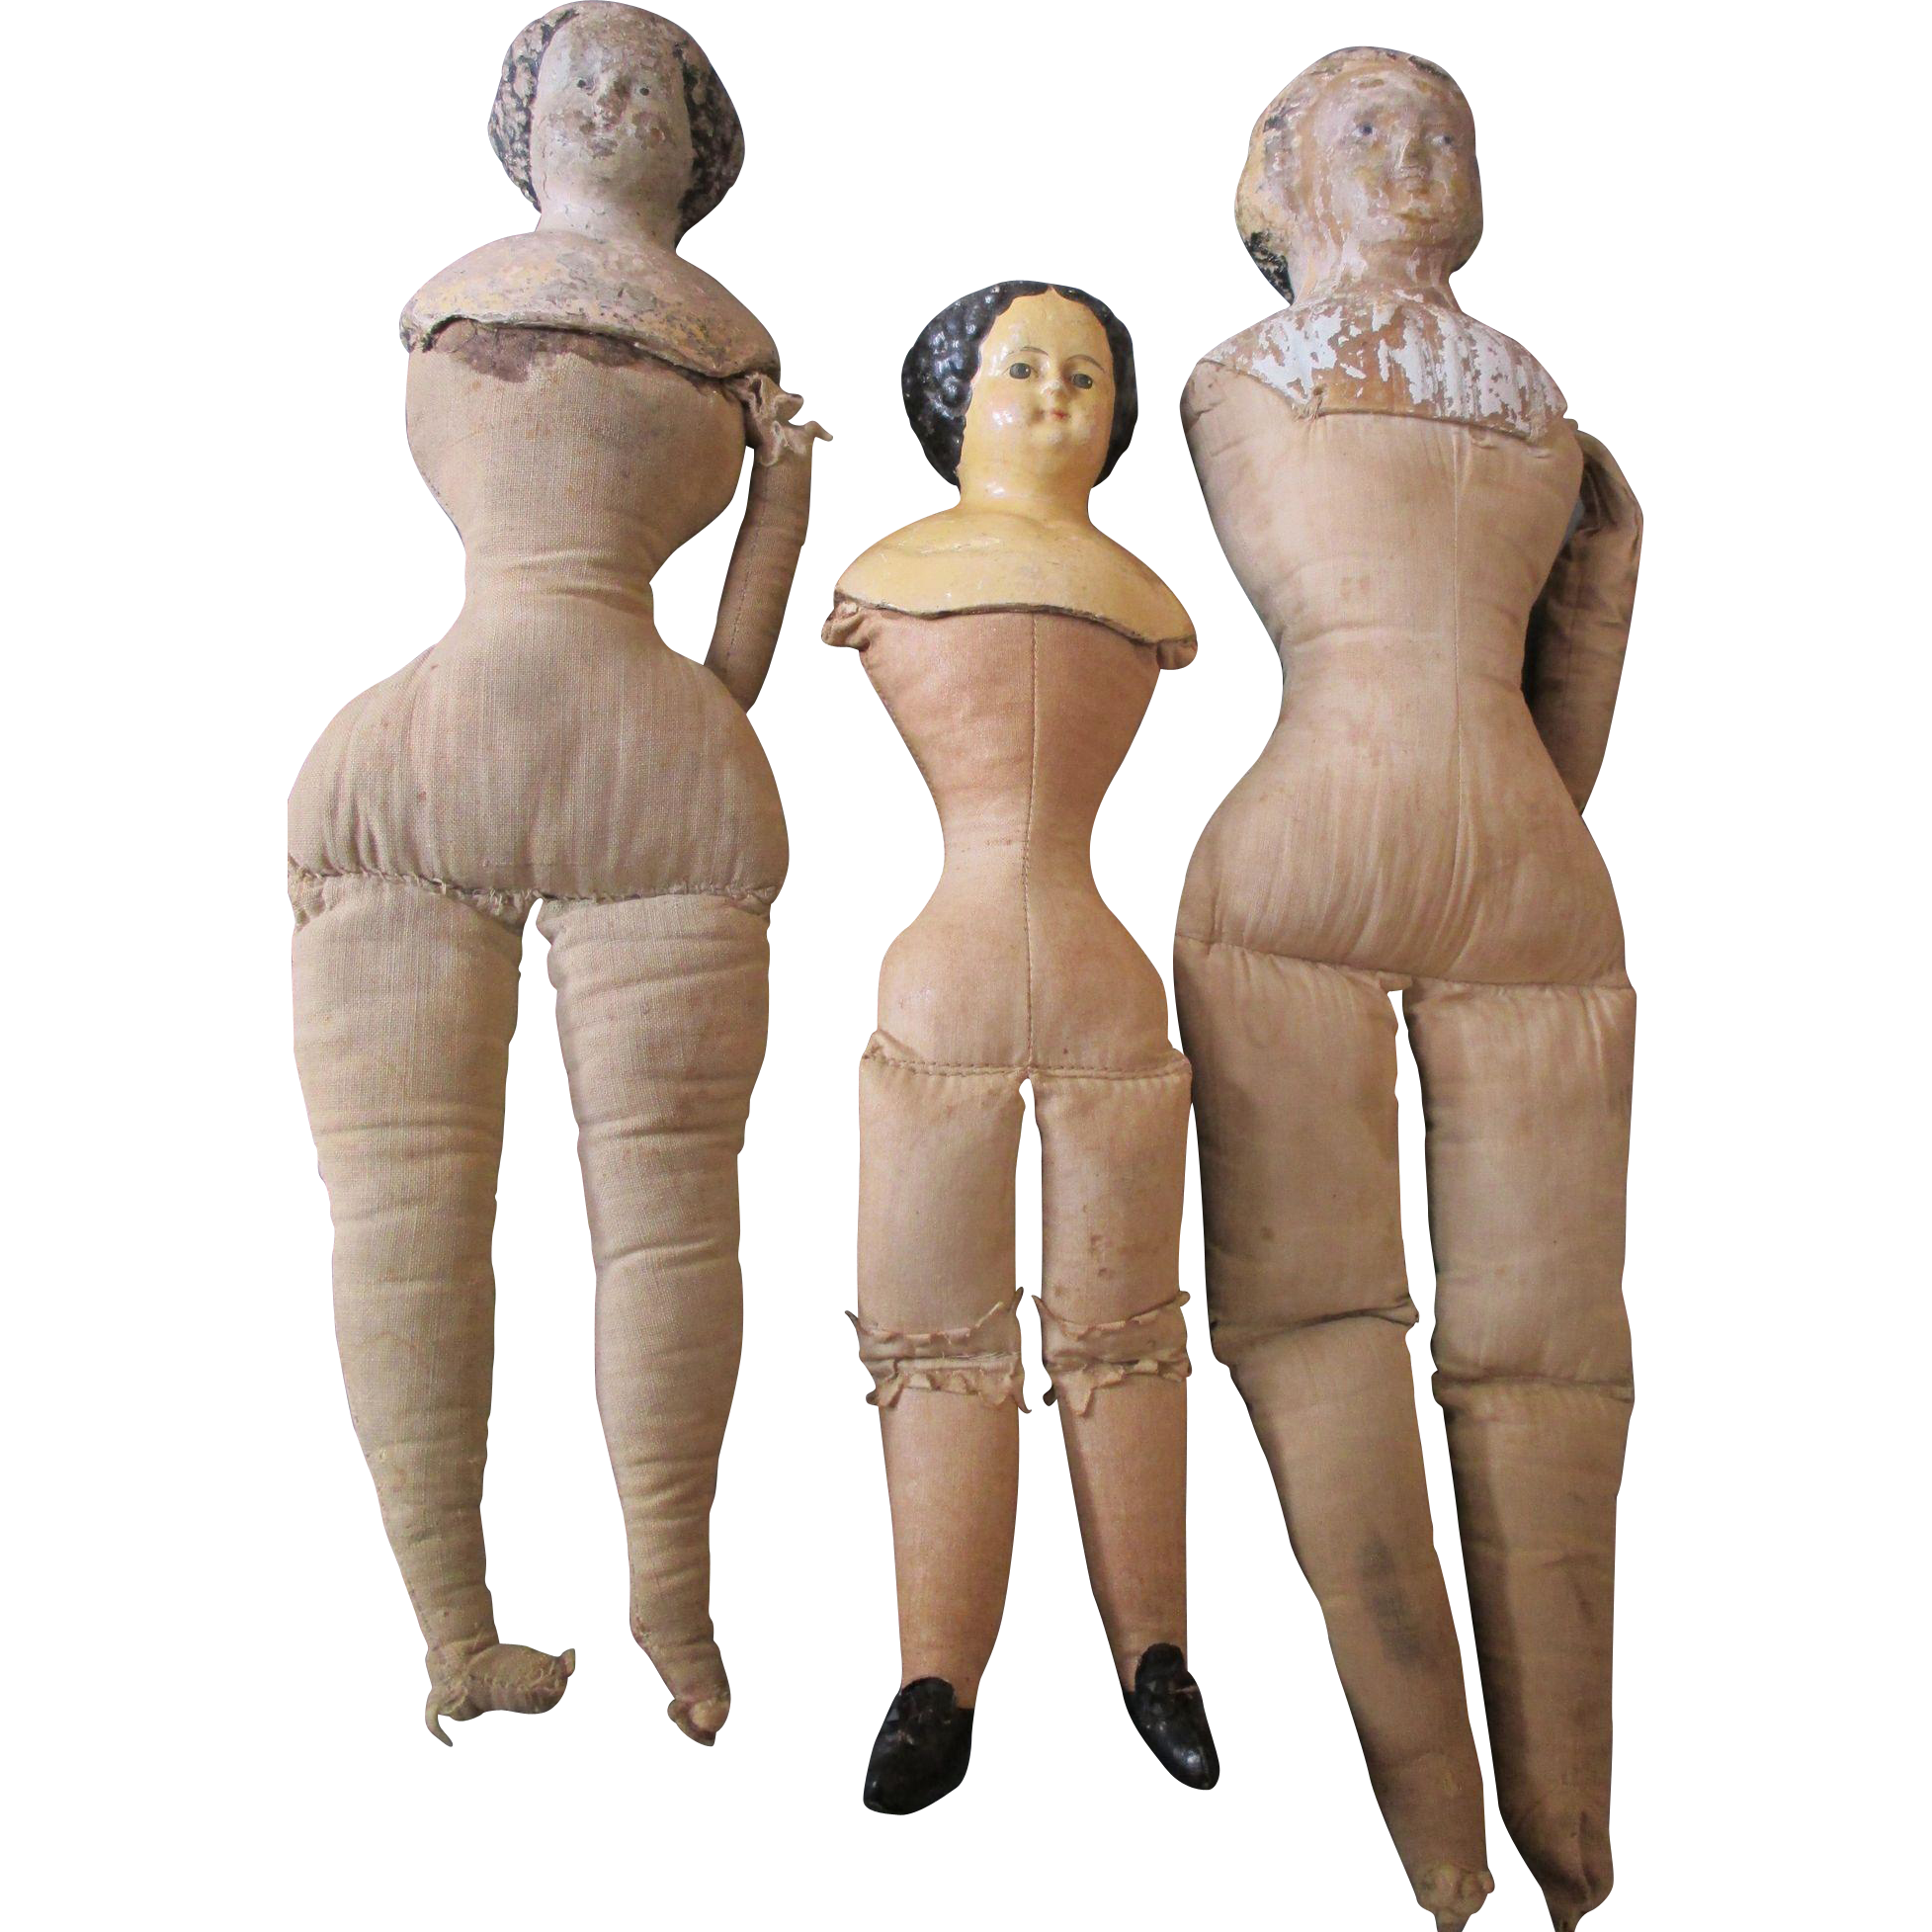 3 Antique Dolls: 2 Paper Mache Head Dolls and a Darrow Rawhide Doll ...